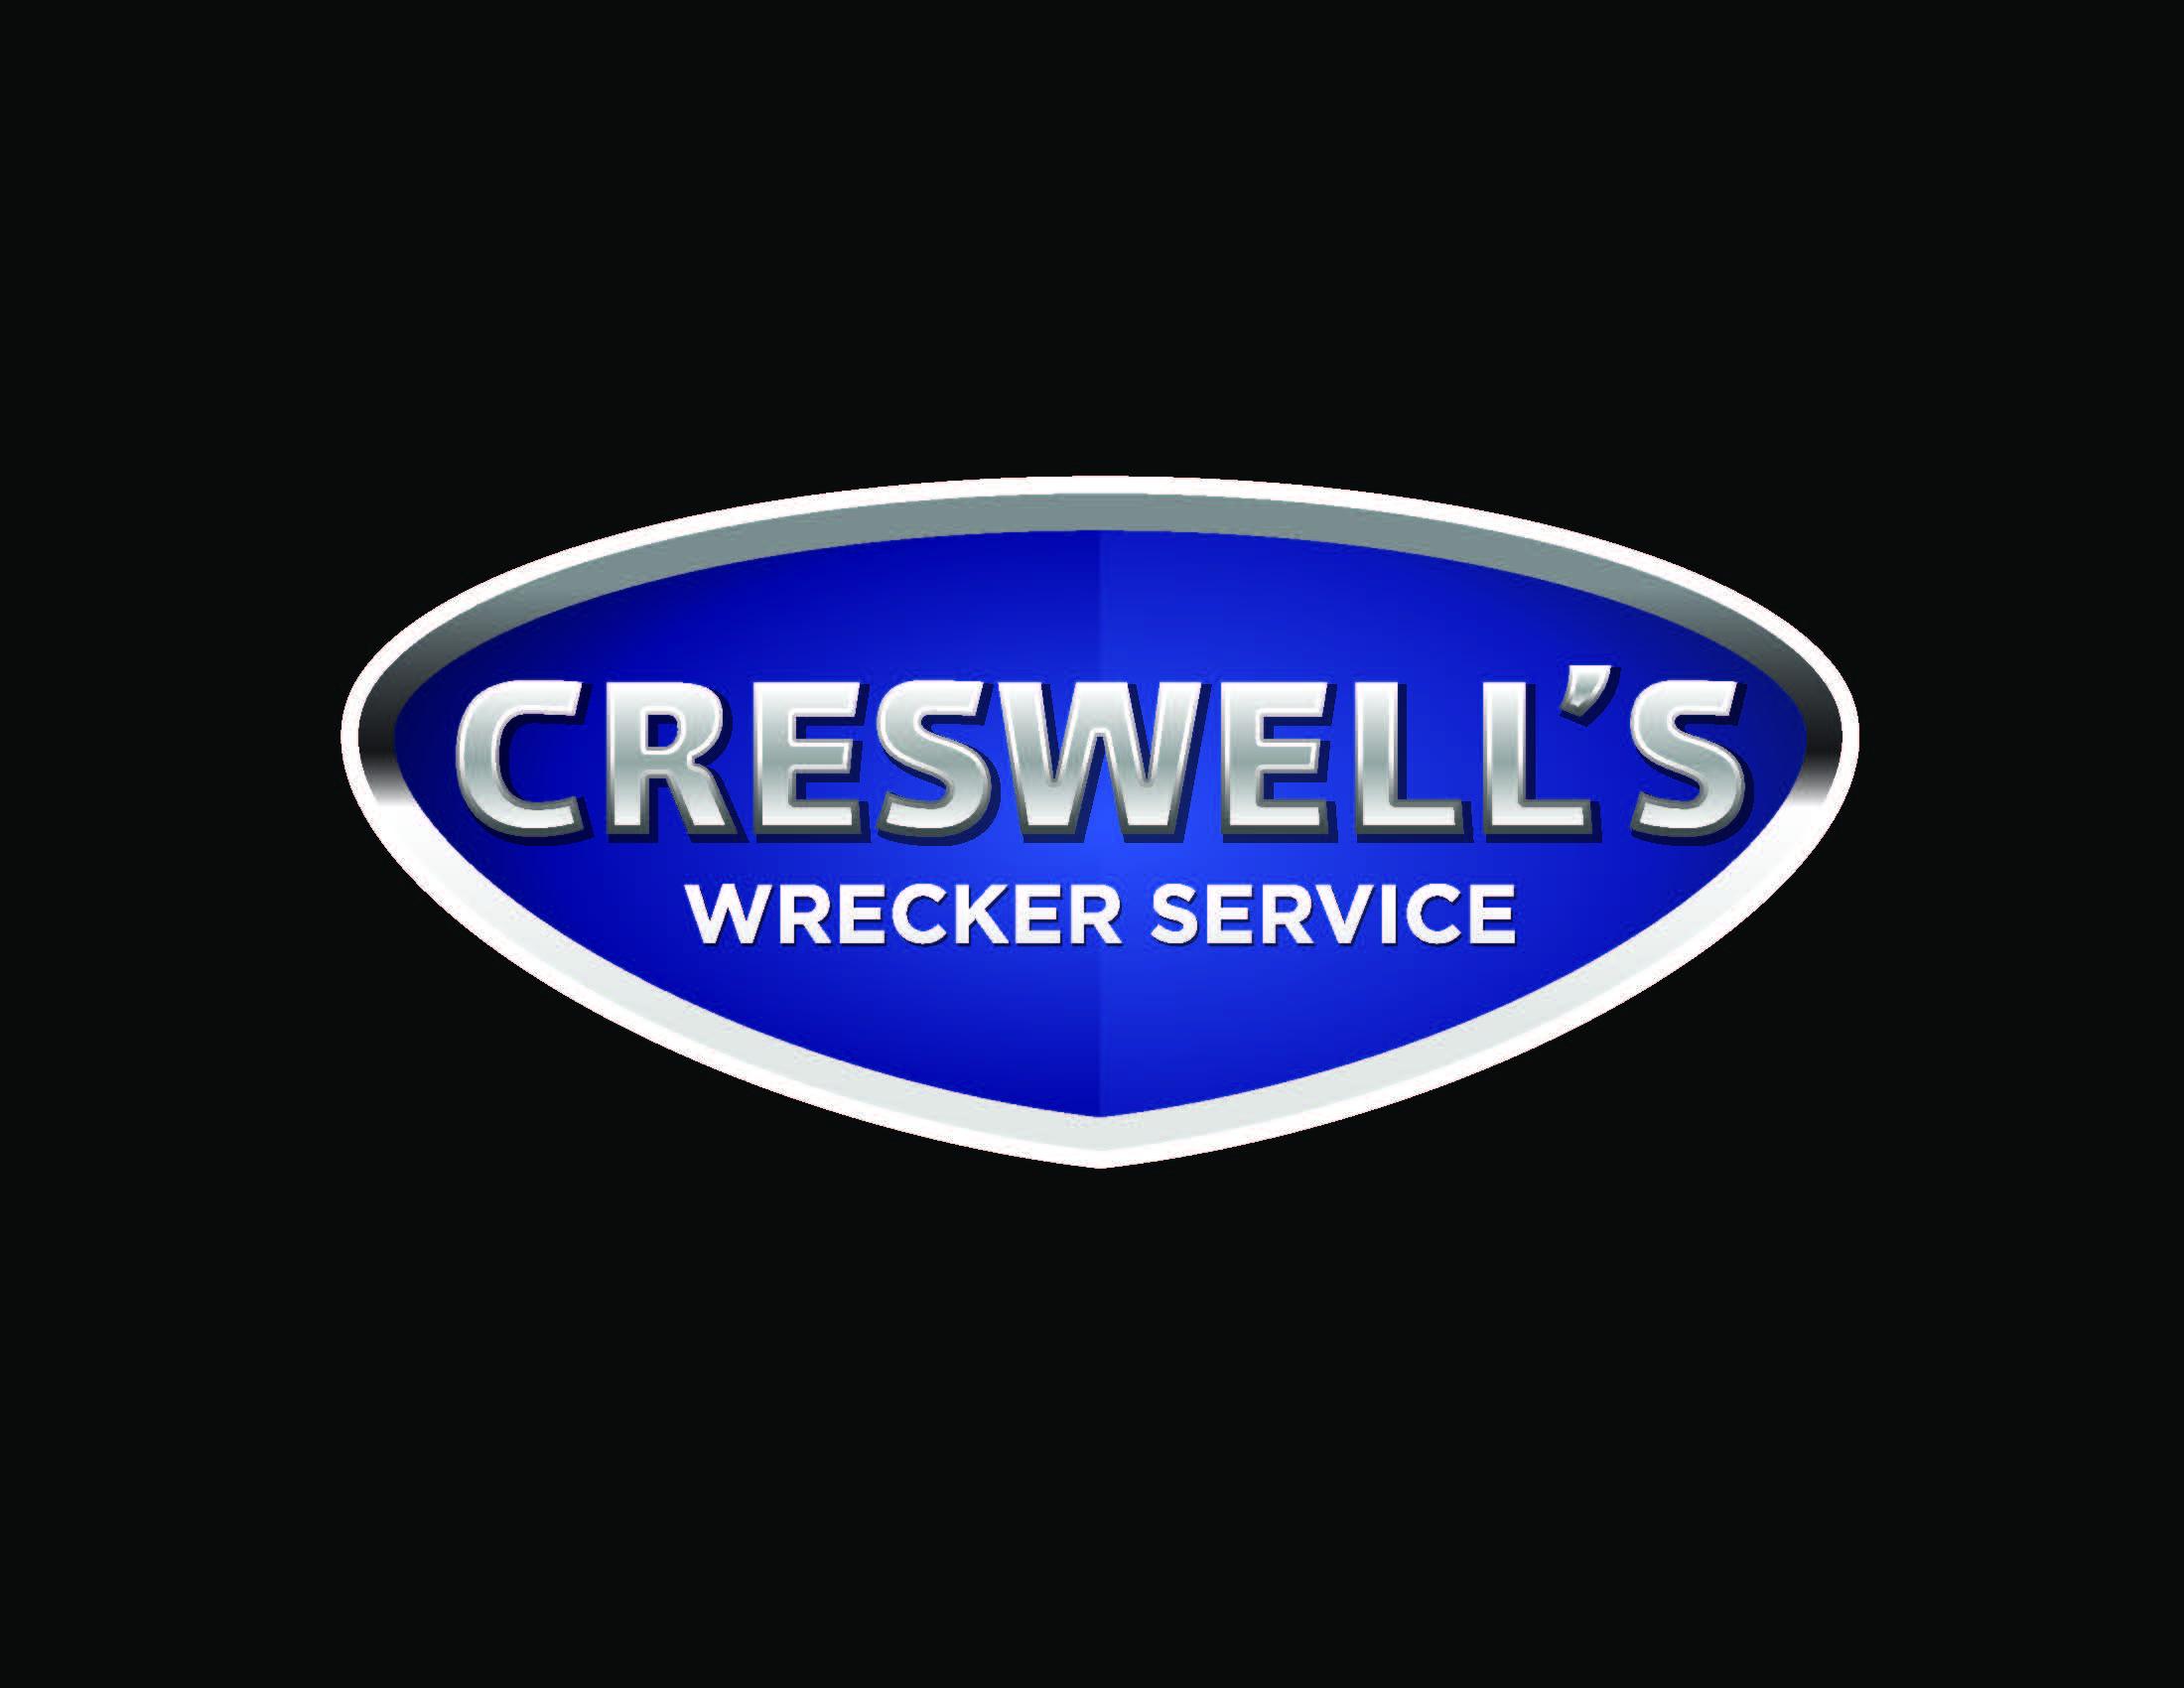 creswells